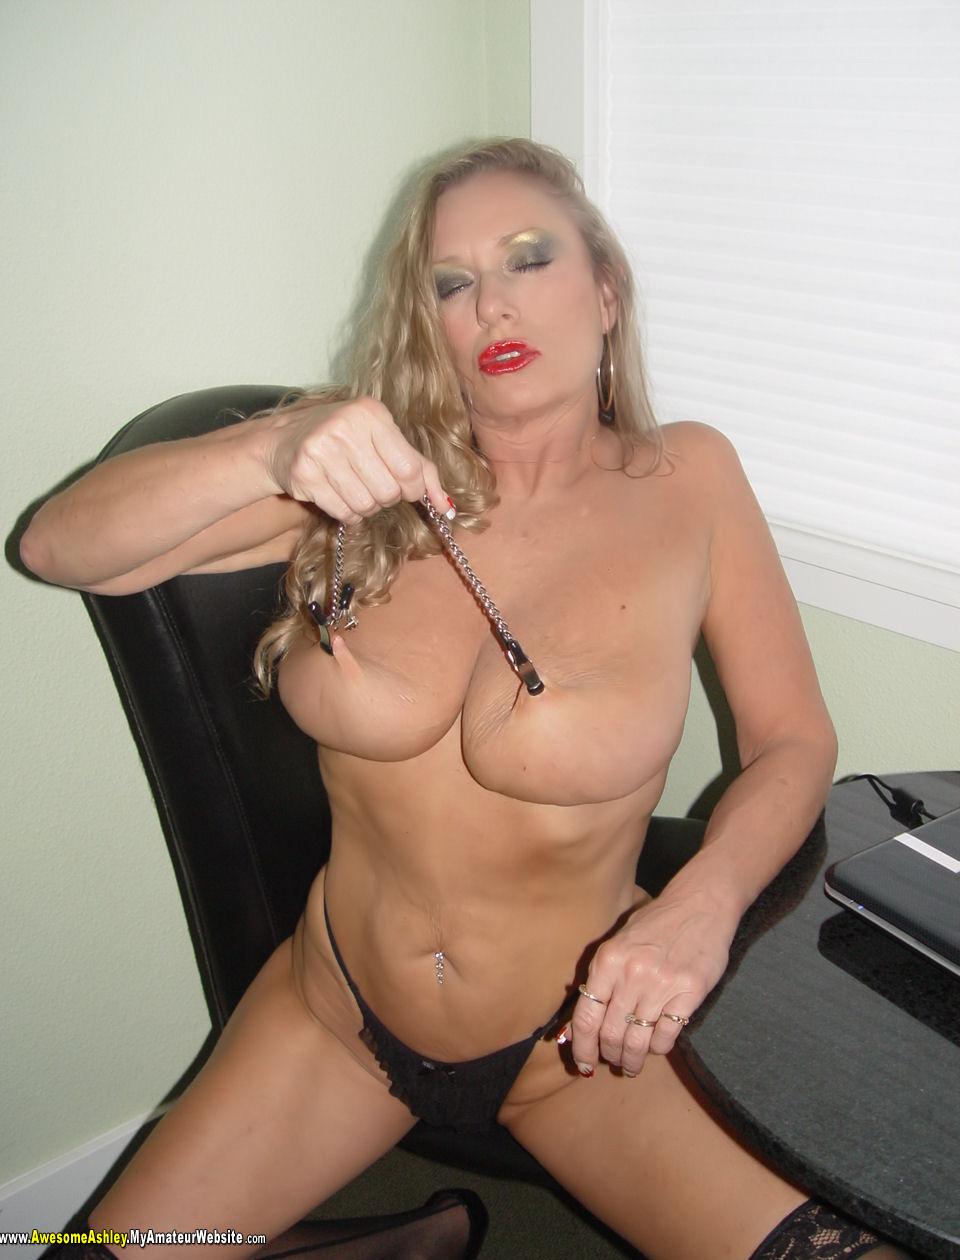 Awesome Ashley Porn Pics awesomeashley your mistress is waiting 01